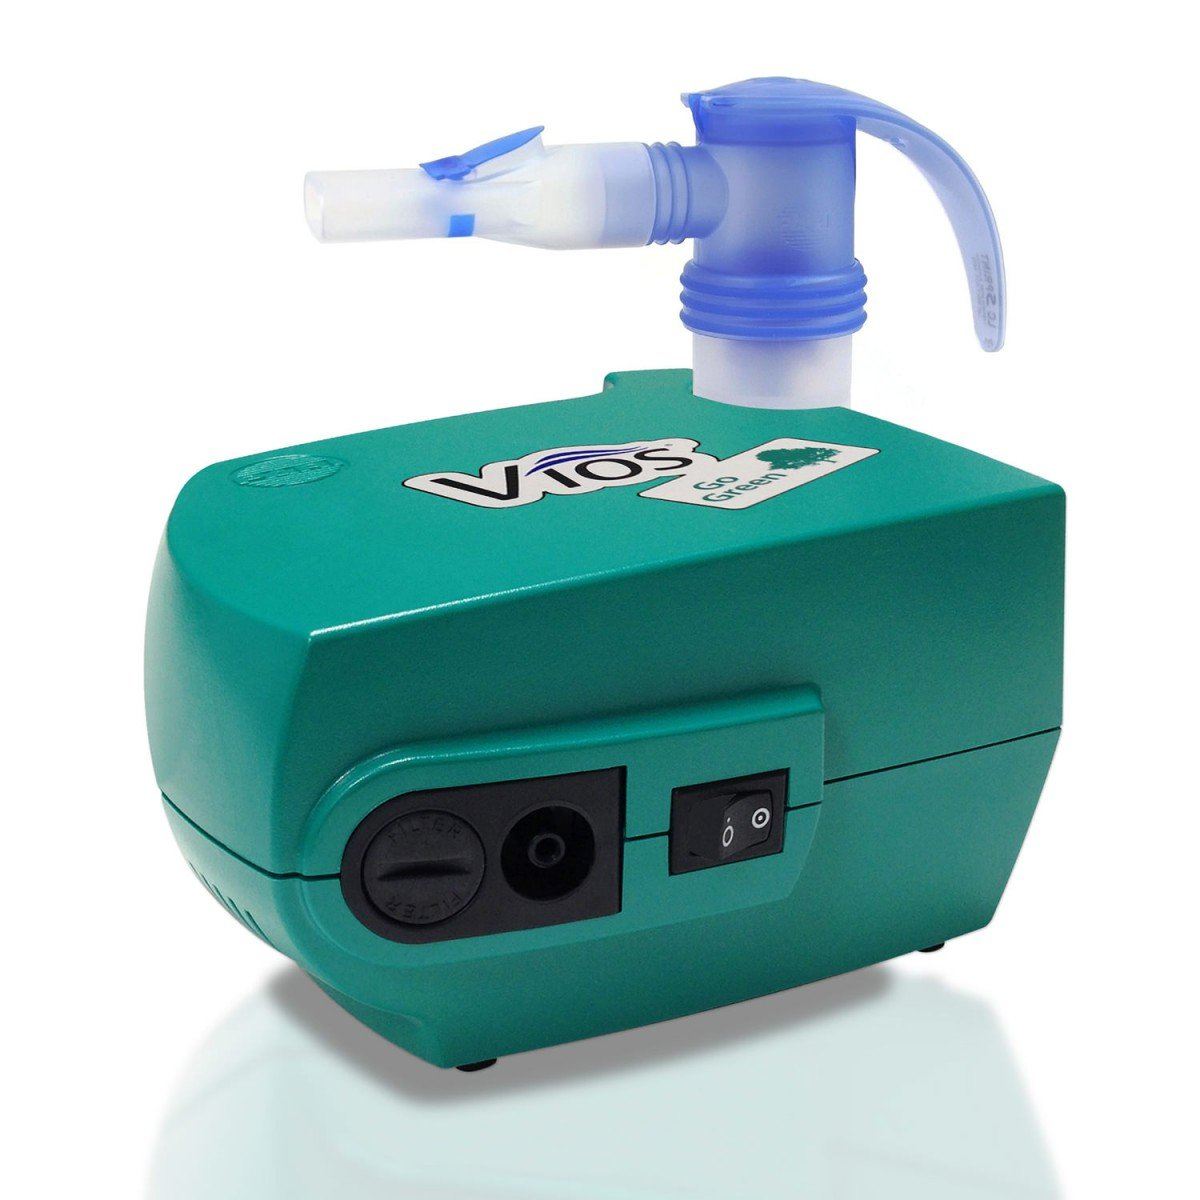 Professional Adult Vaporizer Compressor with Sprint Kit and Bonus Reusable Kit